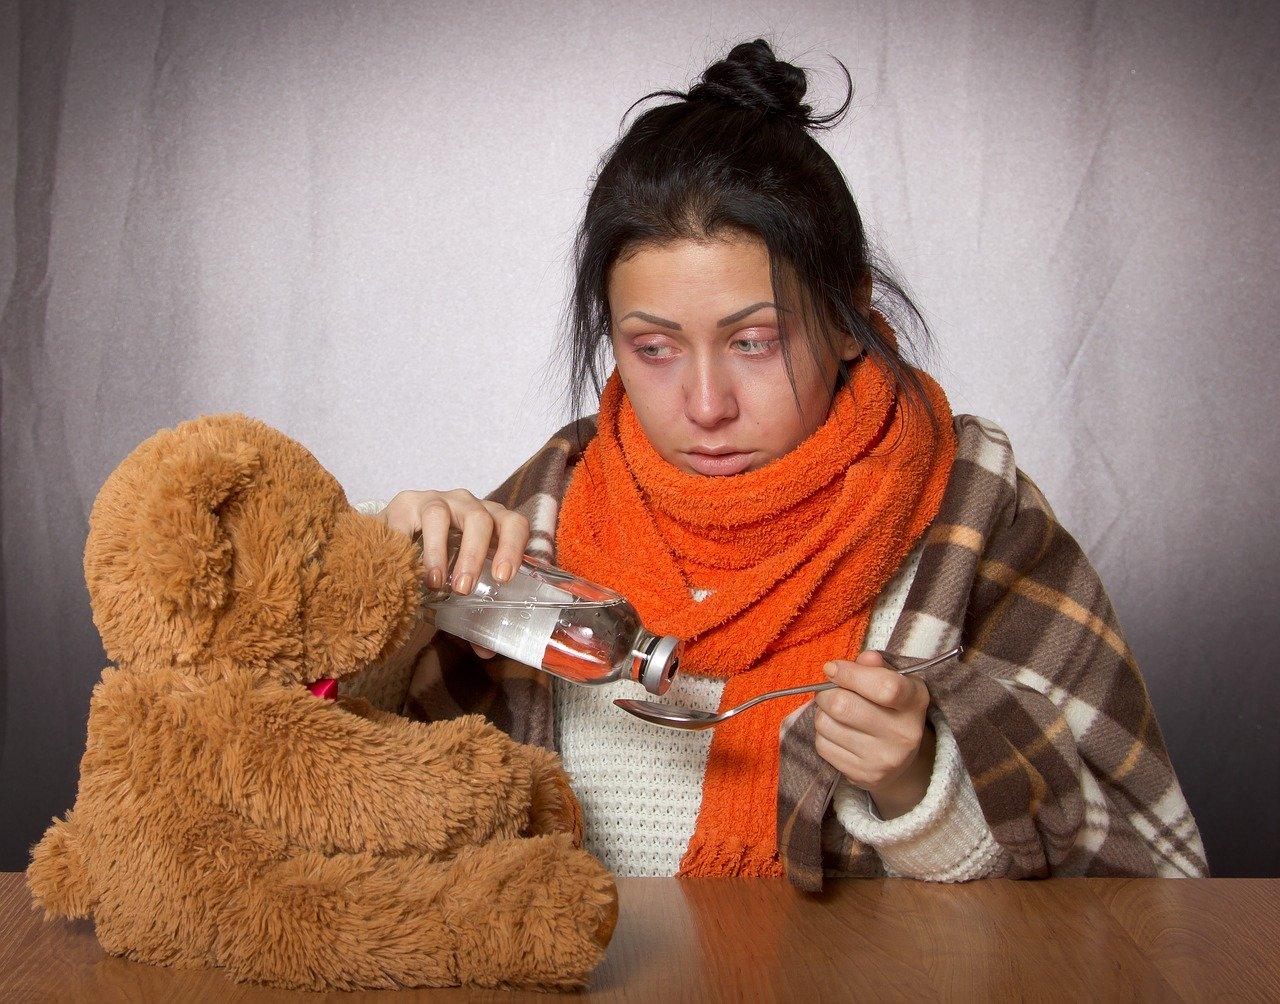 Influenza marzo 2020 sintomi e contagio